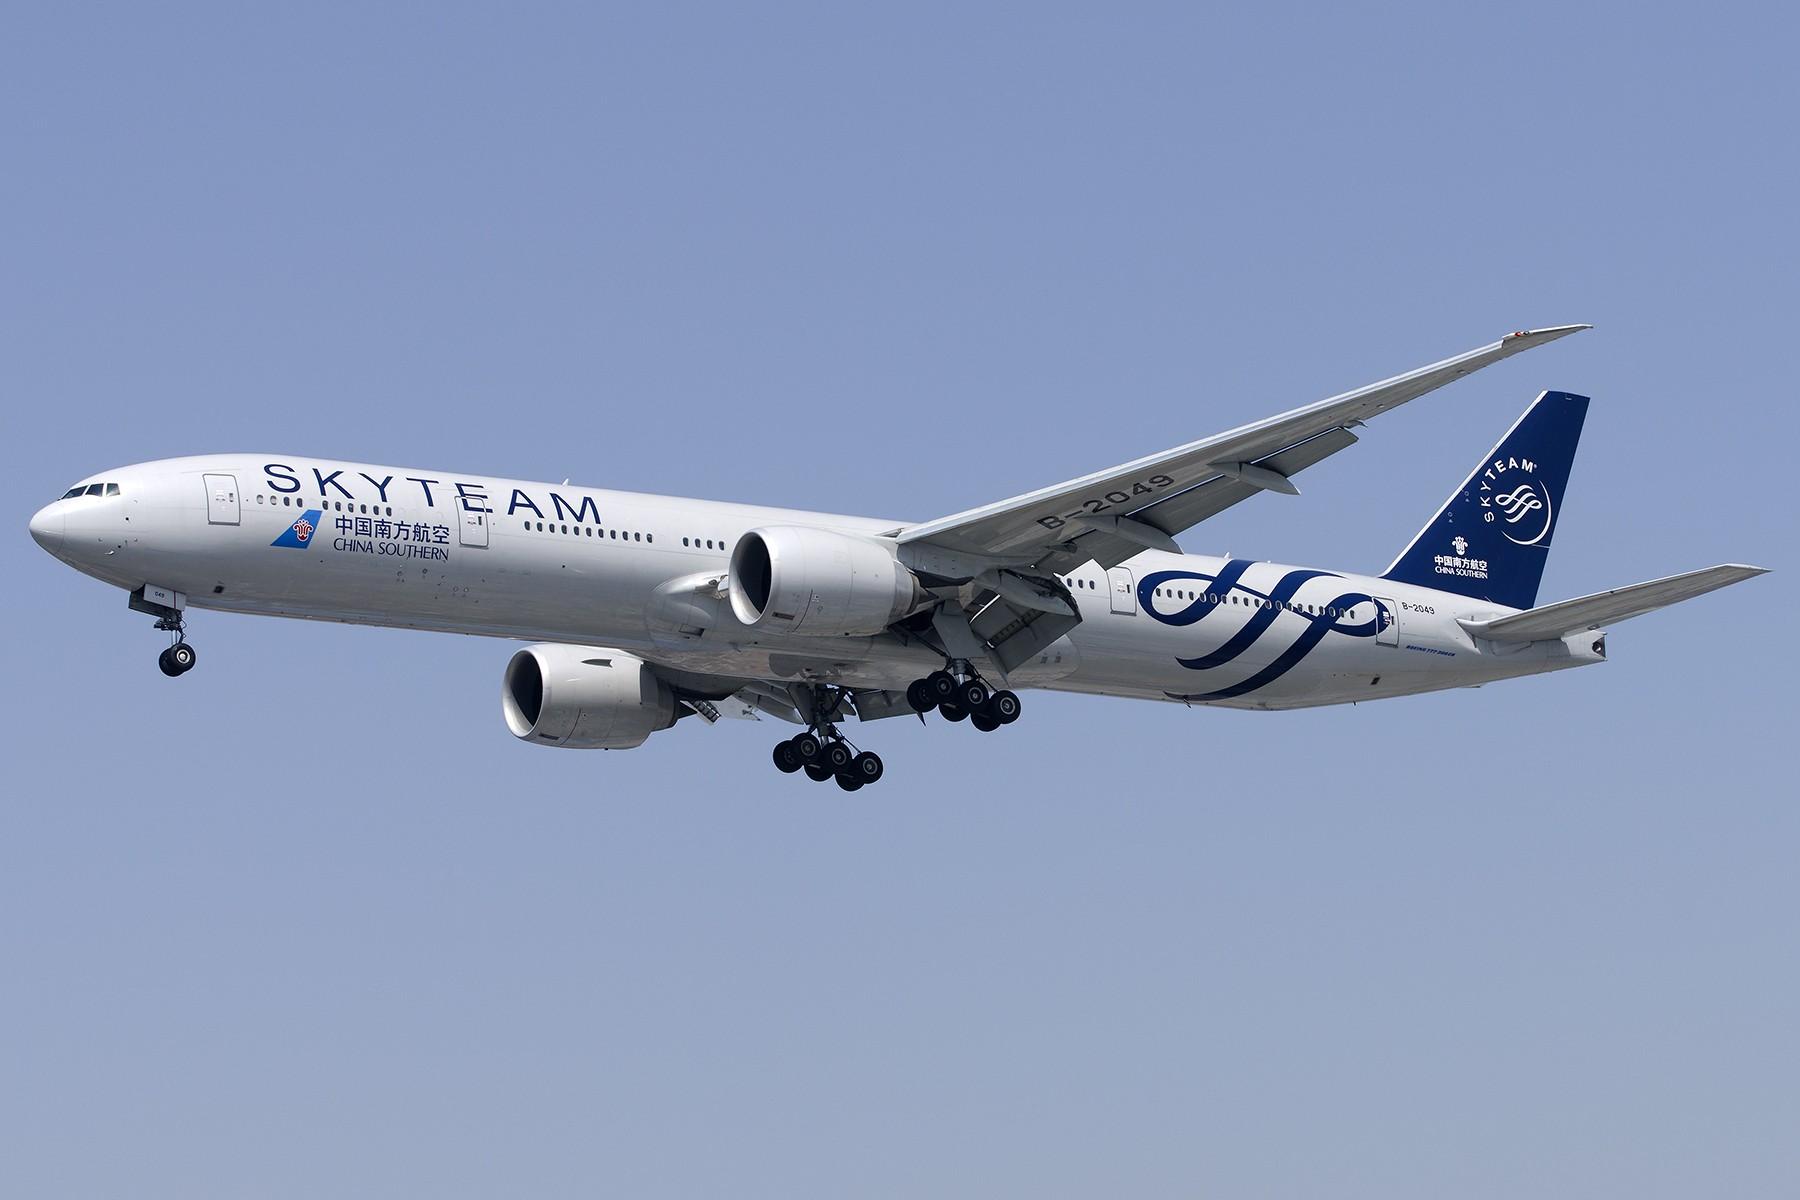 Re:[原创][原创]【SHA拍机*1800大图】4月拍的了,记得那天好货还挺多 BOEING 777-300ER B-2049 中国上海虹桥国际机场